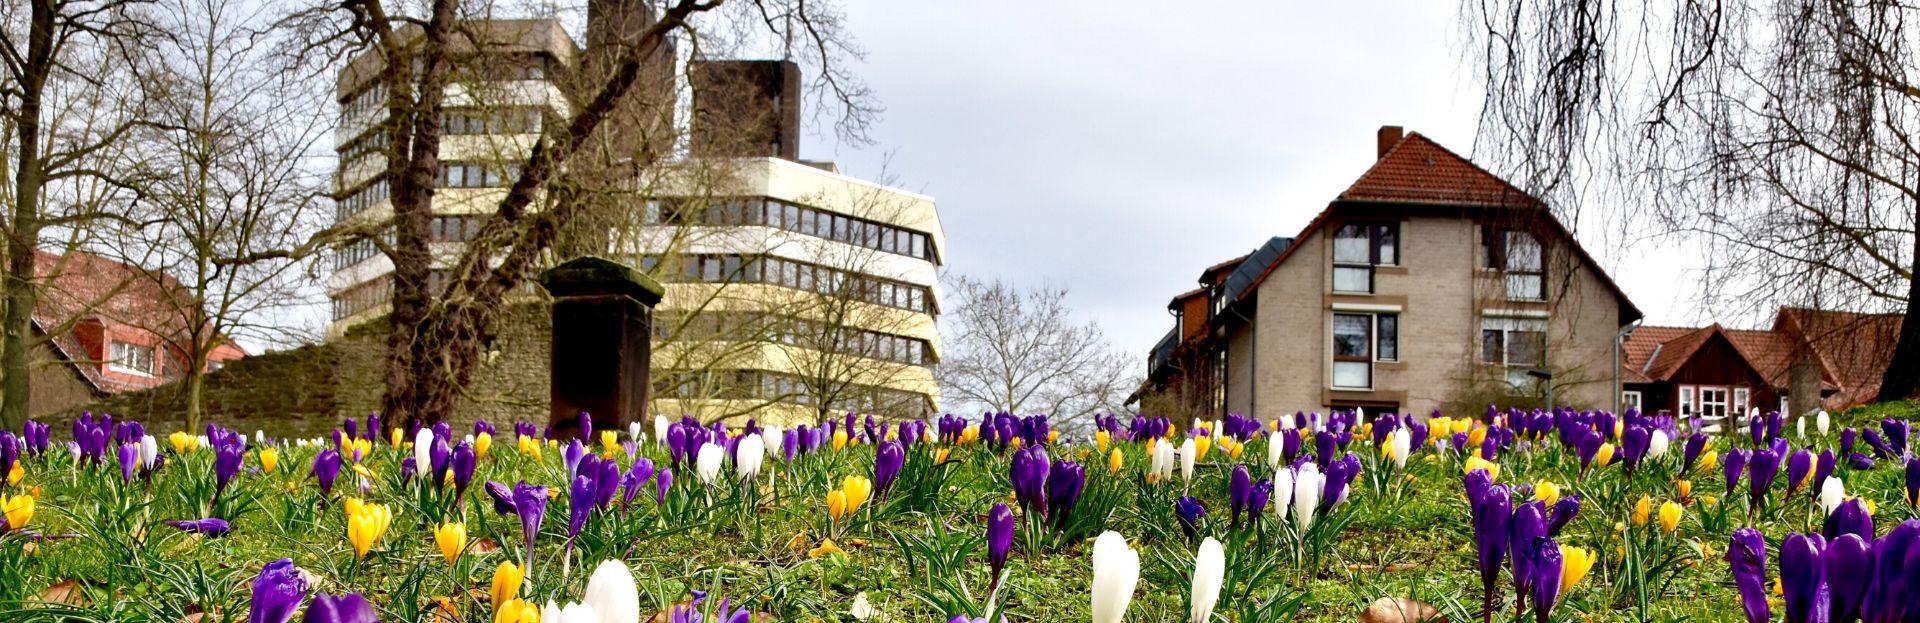 Kreishaus im Frühling